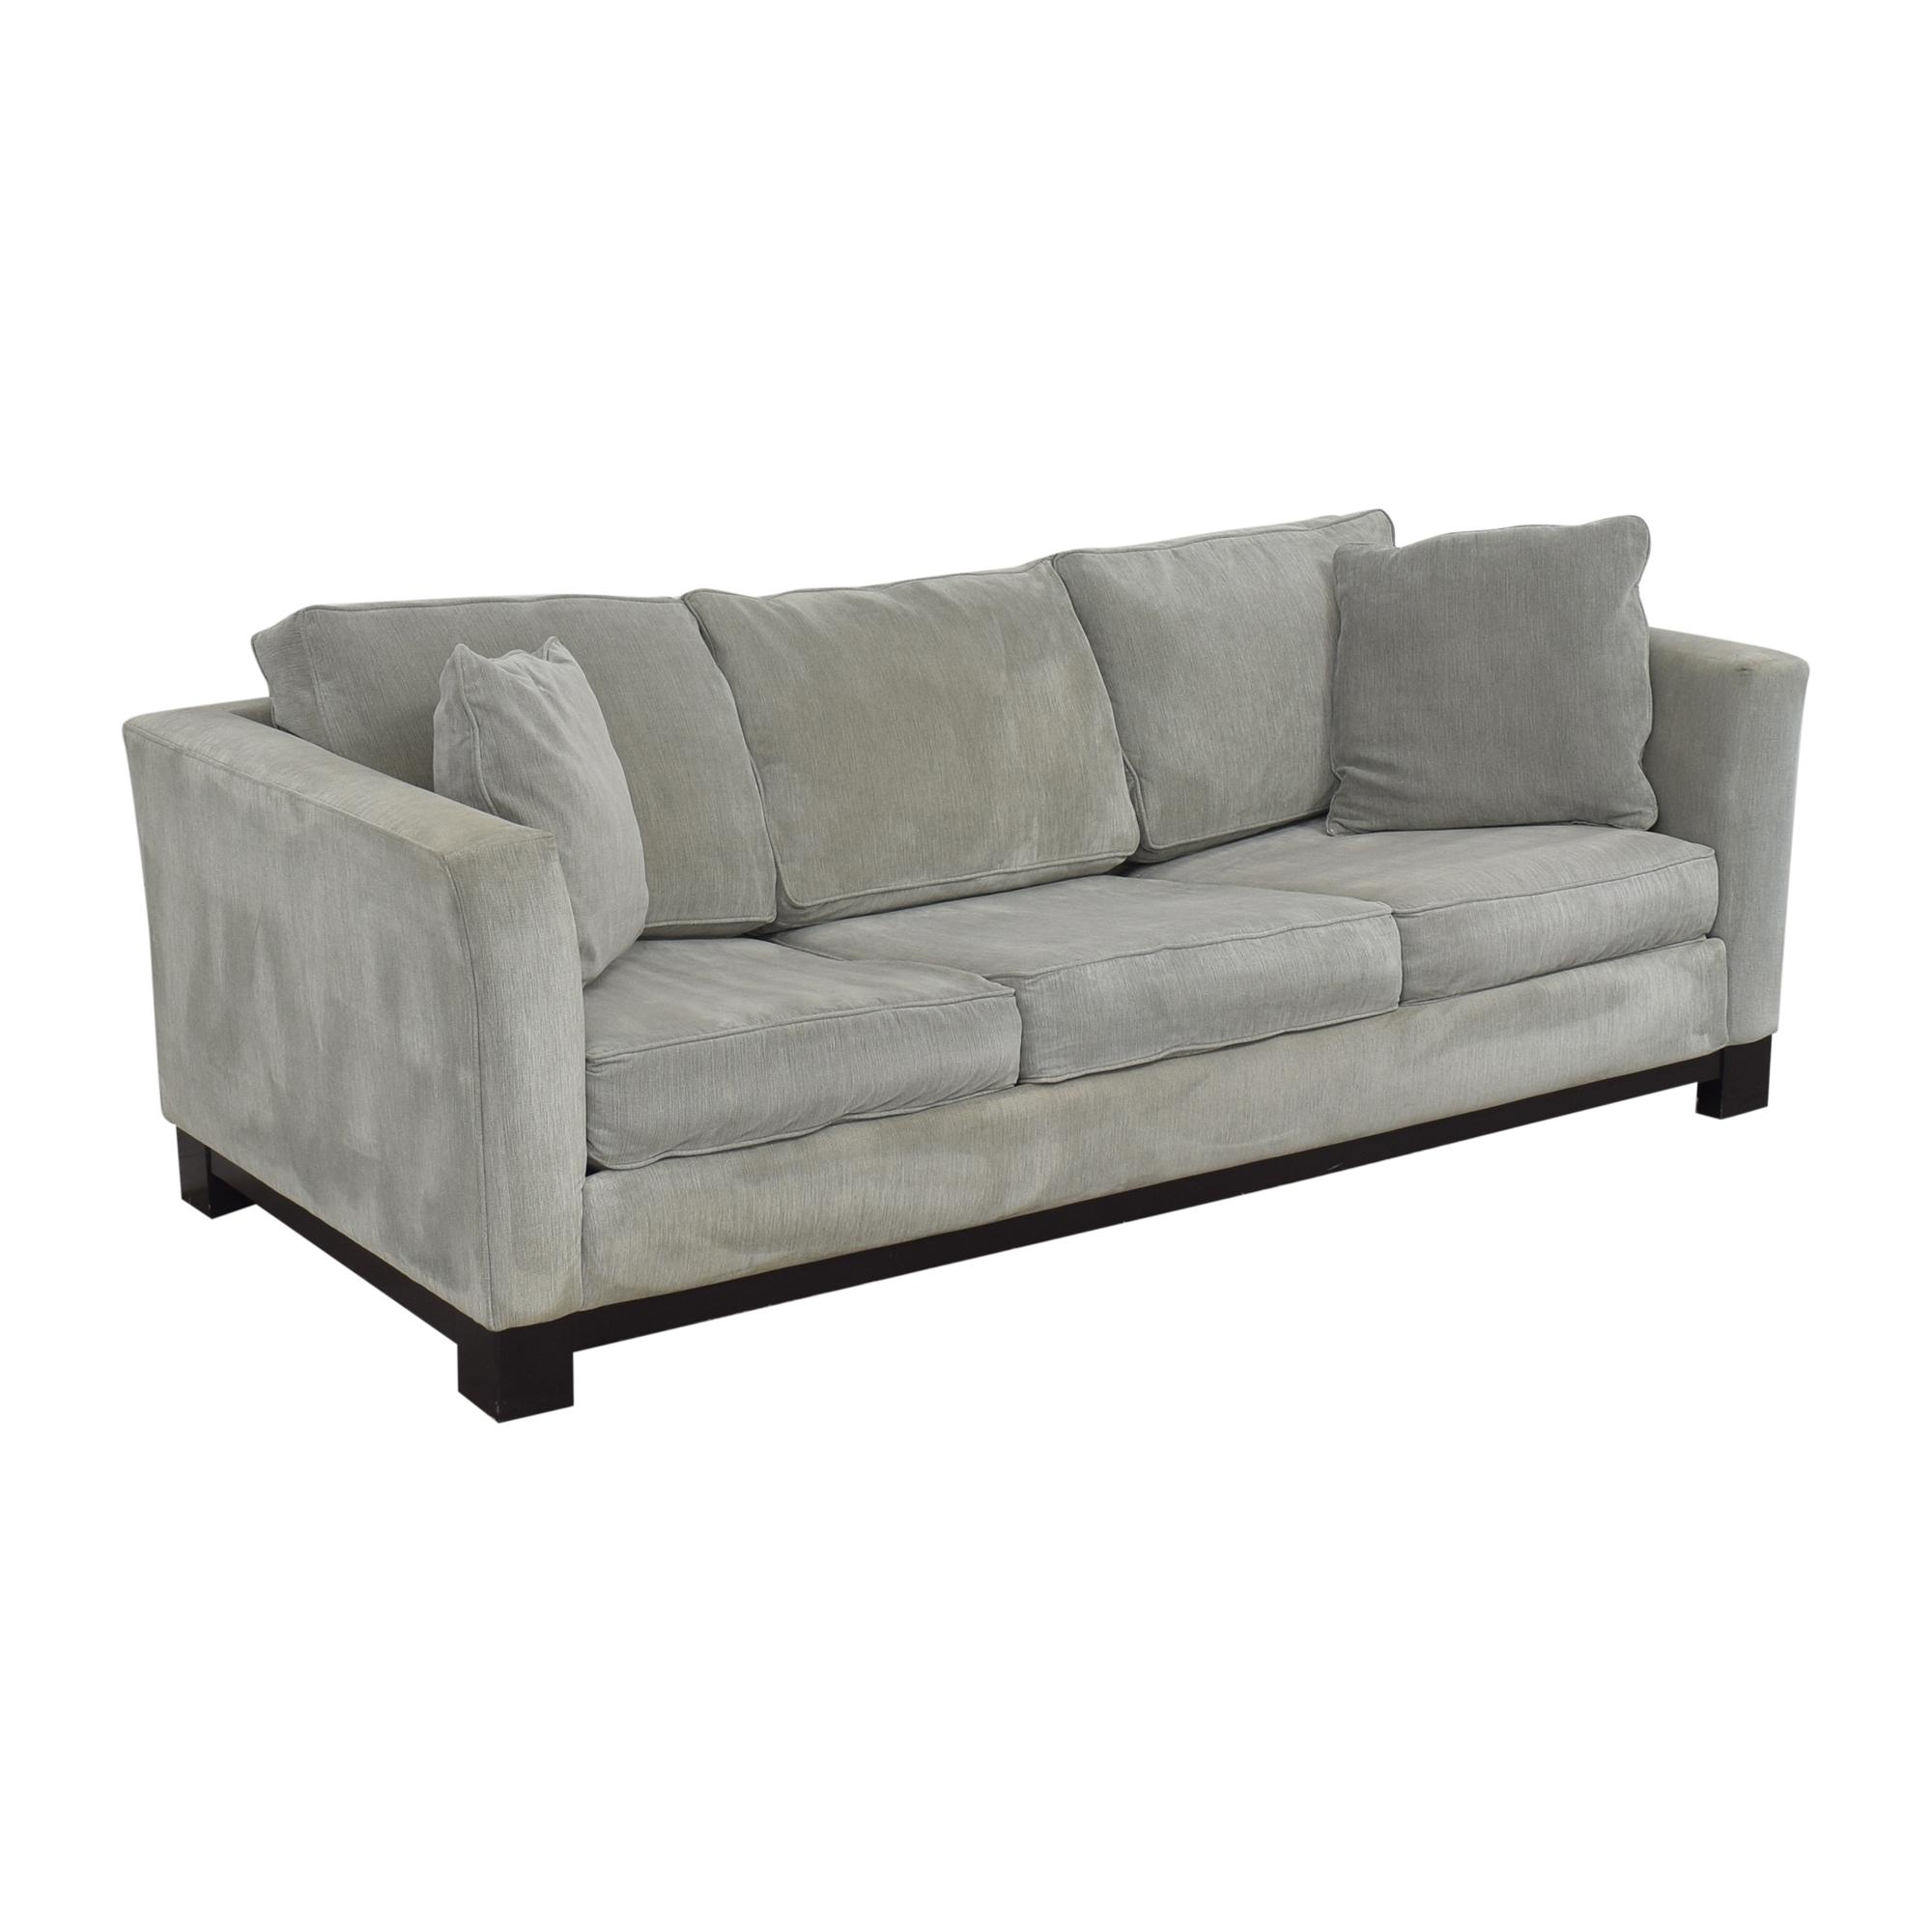 Macy's Macy's Kenton Sleeper Sofa Sofa Beds